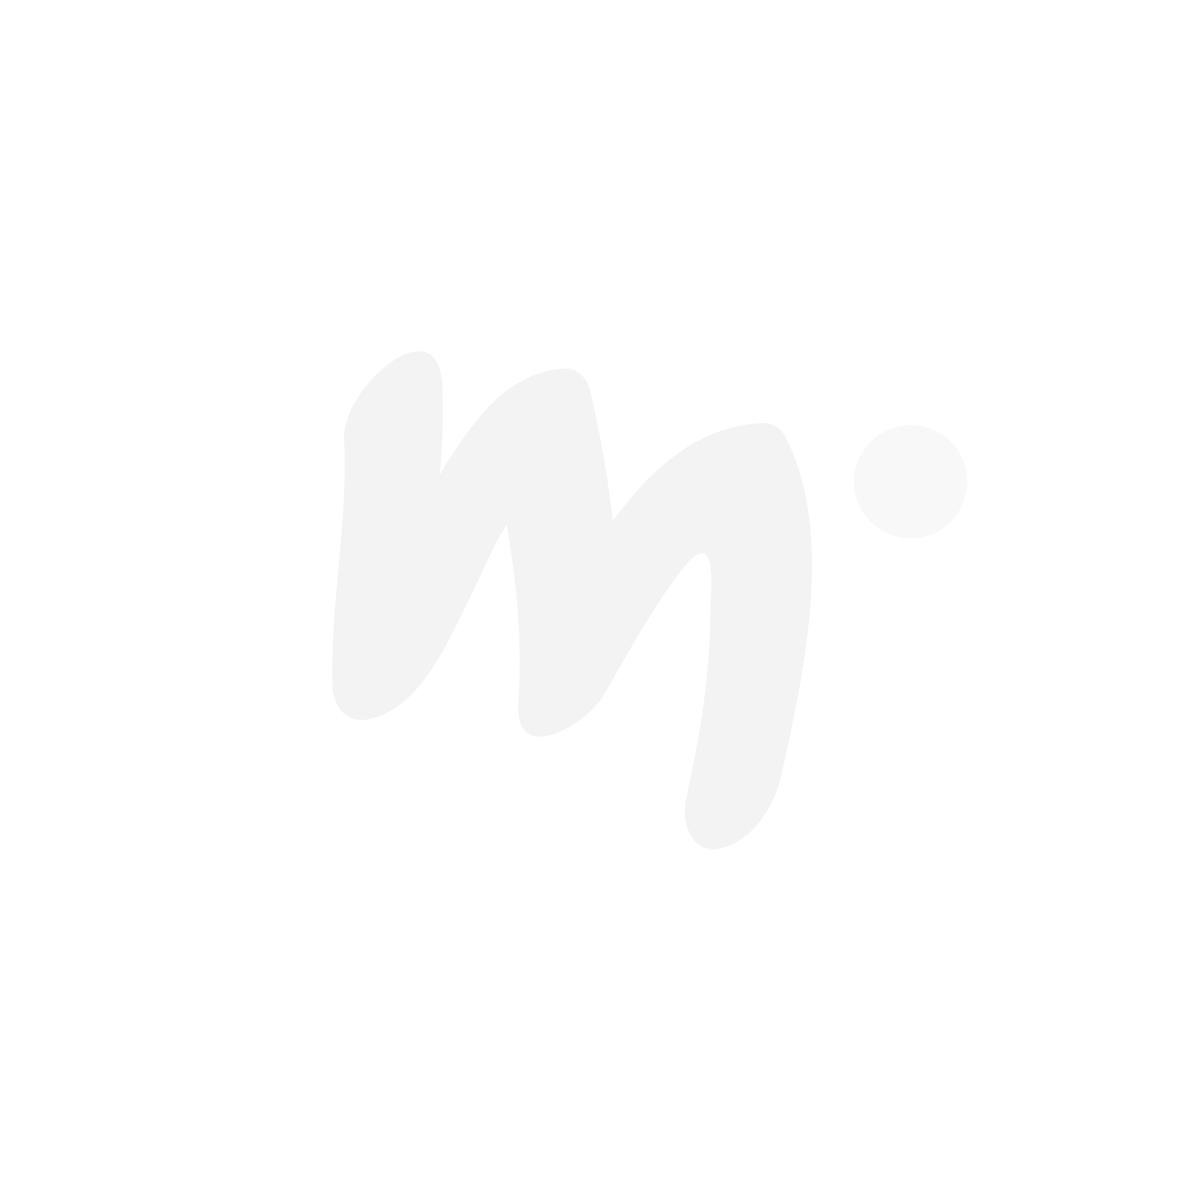 Moomin Sand Molds 6-pack